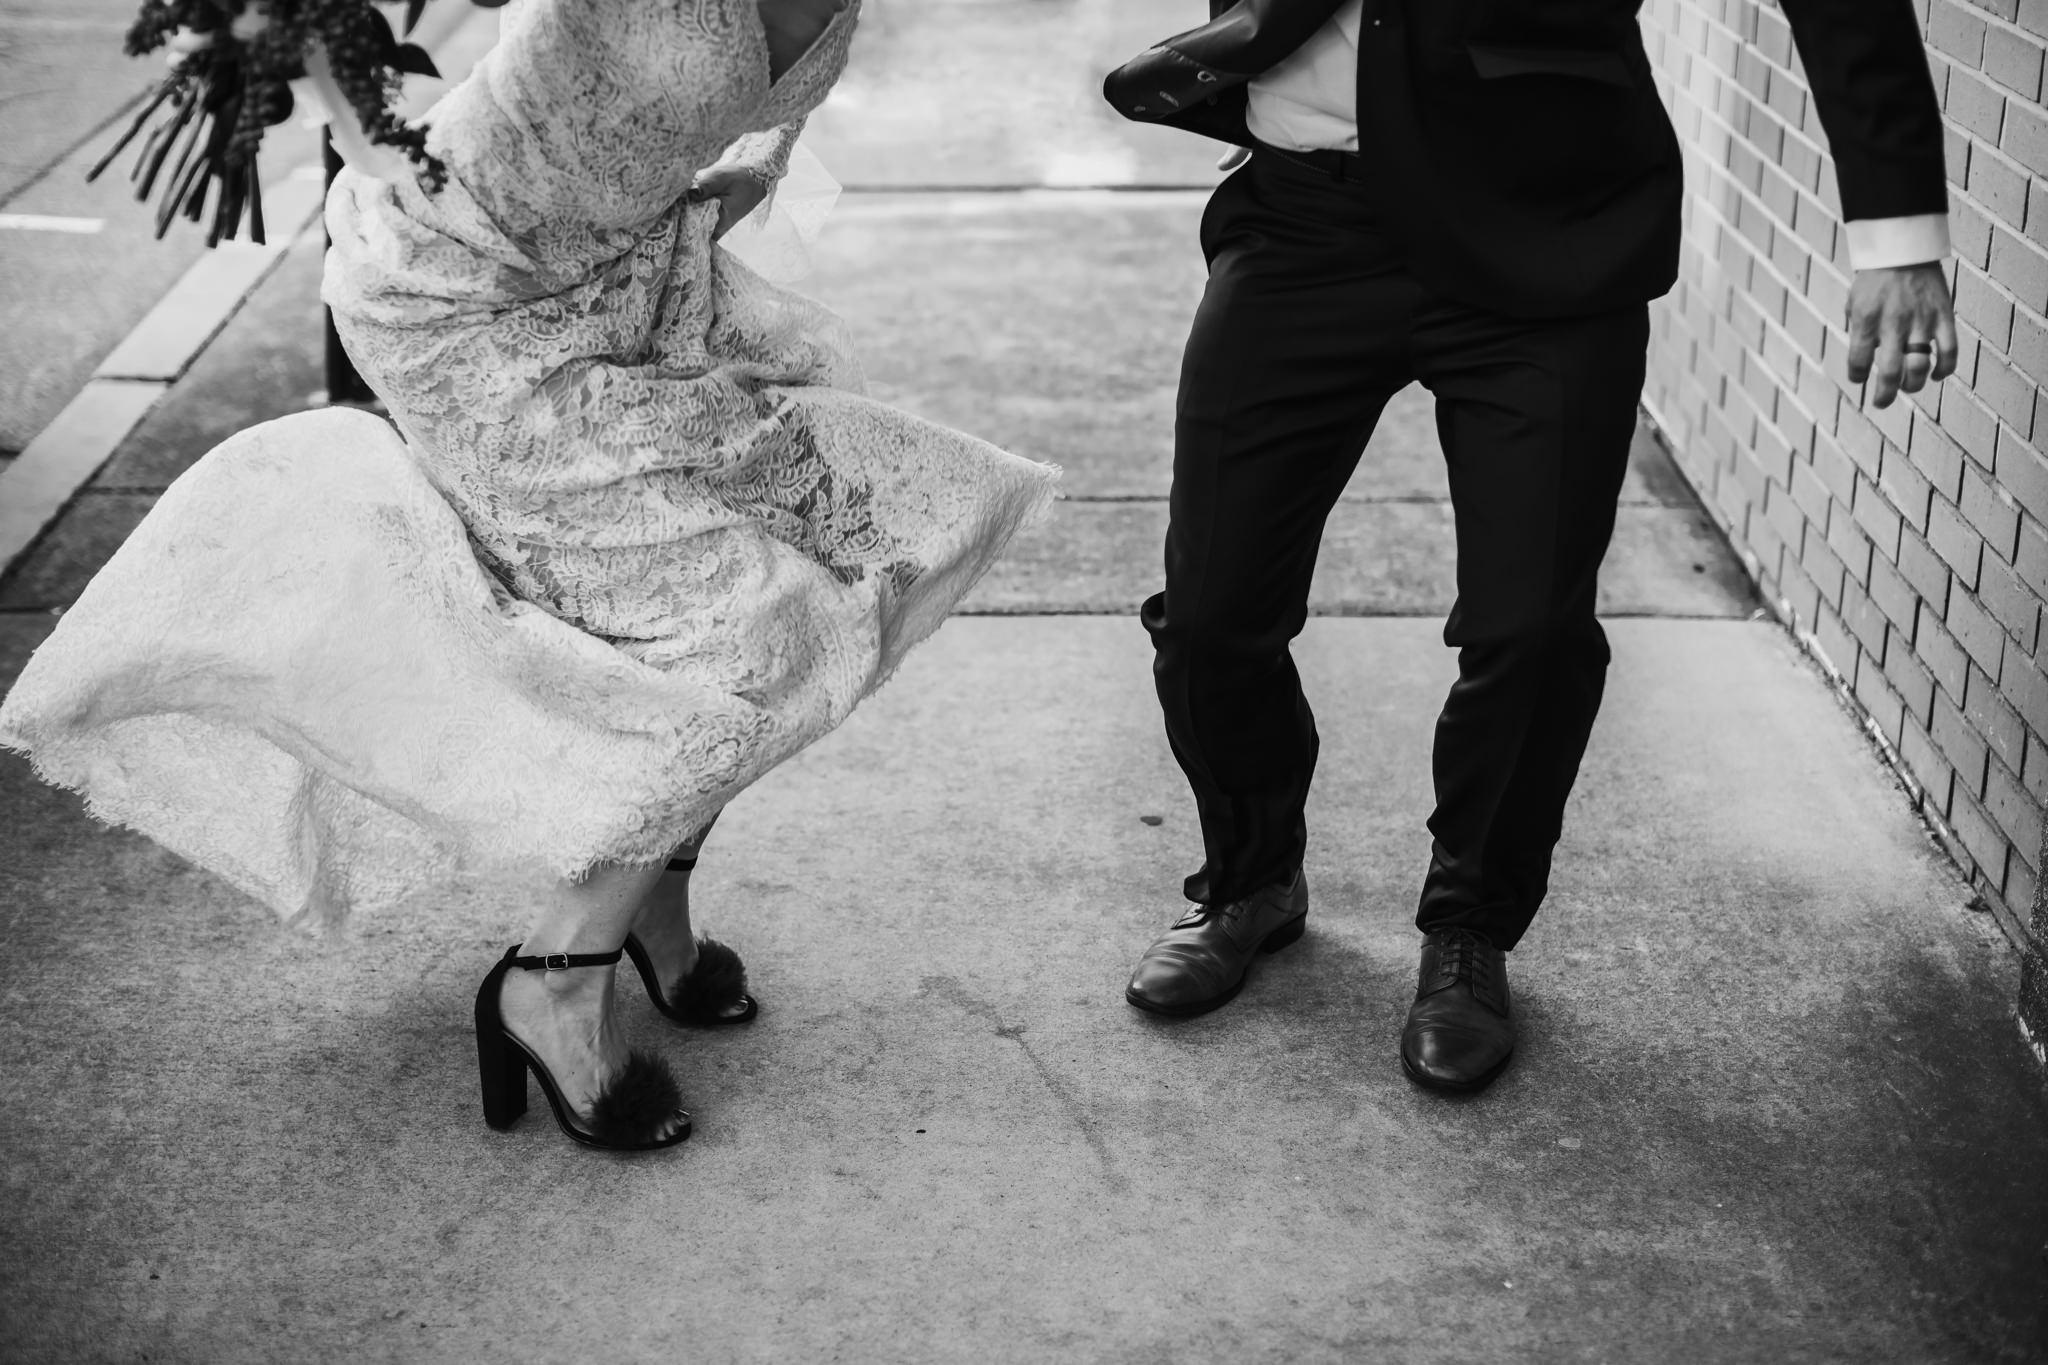 cassie-cook-photography-chattanooga-wedding-photographer-waterhouse-pavillion-cassie-matt-wedding-89.jpg